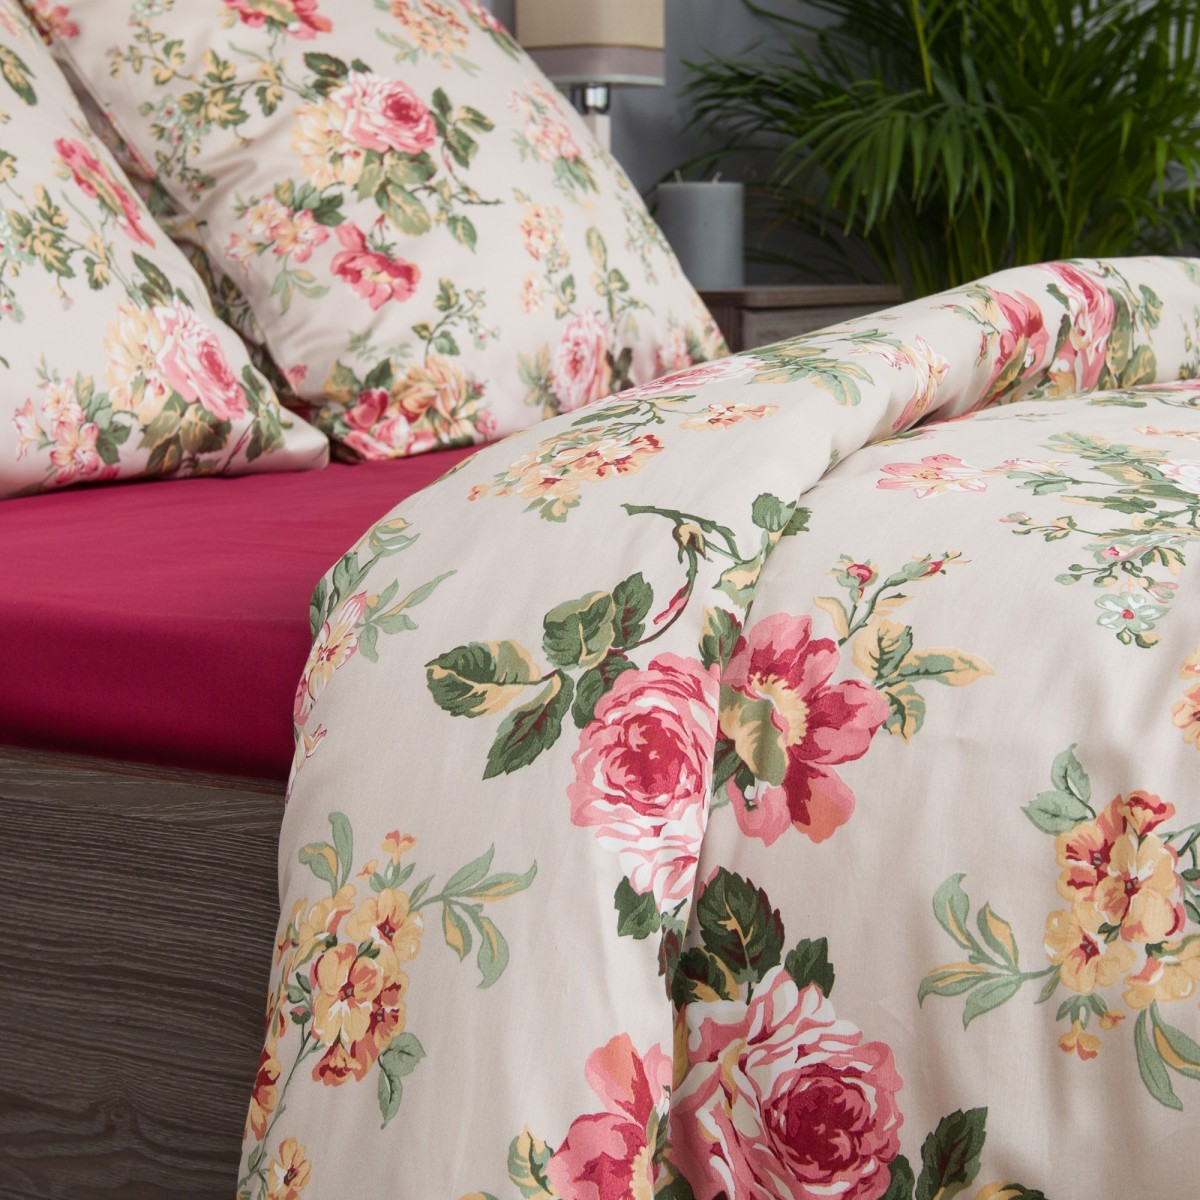 Комплект Постельного Белья Розарий Евро Сатин 70x70